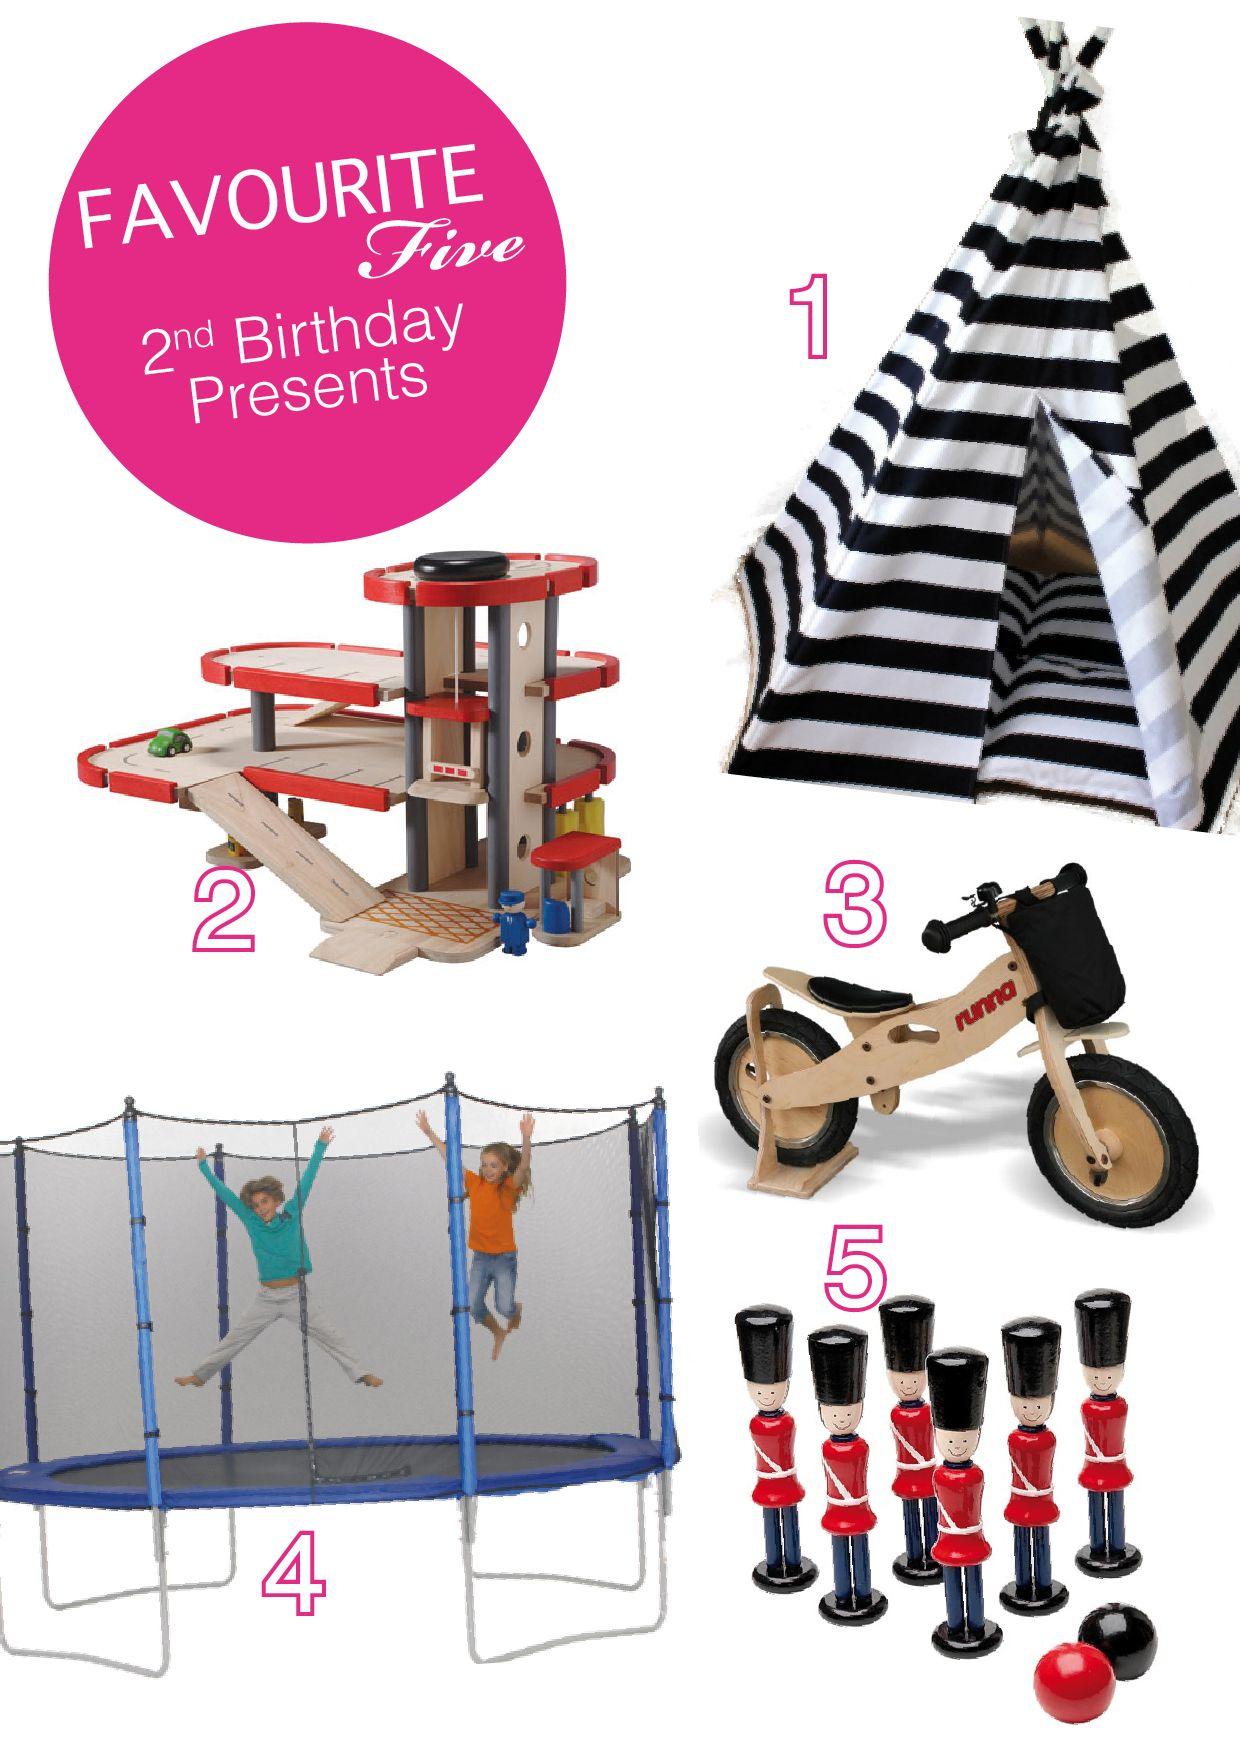 Toddler birthday gift ideas. Toddler birthday, Toddler